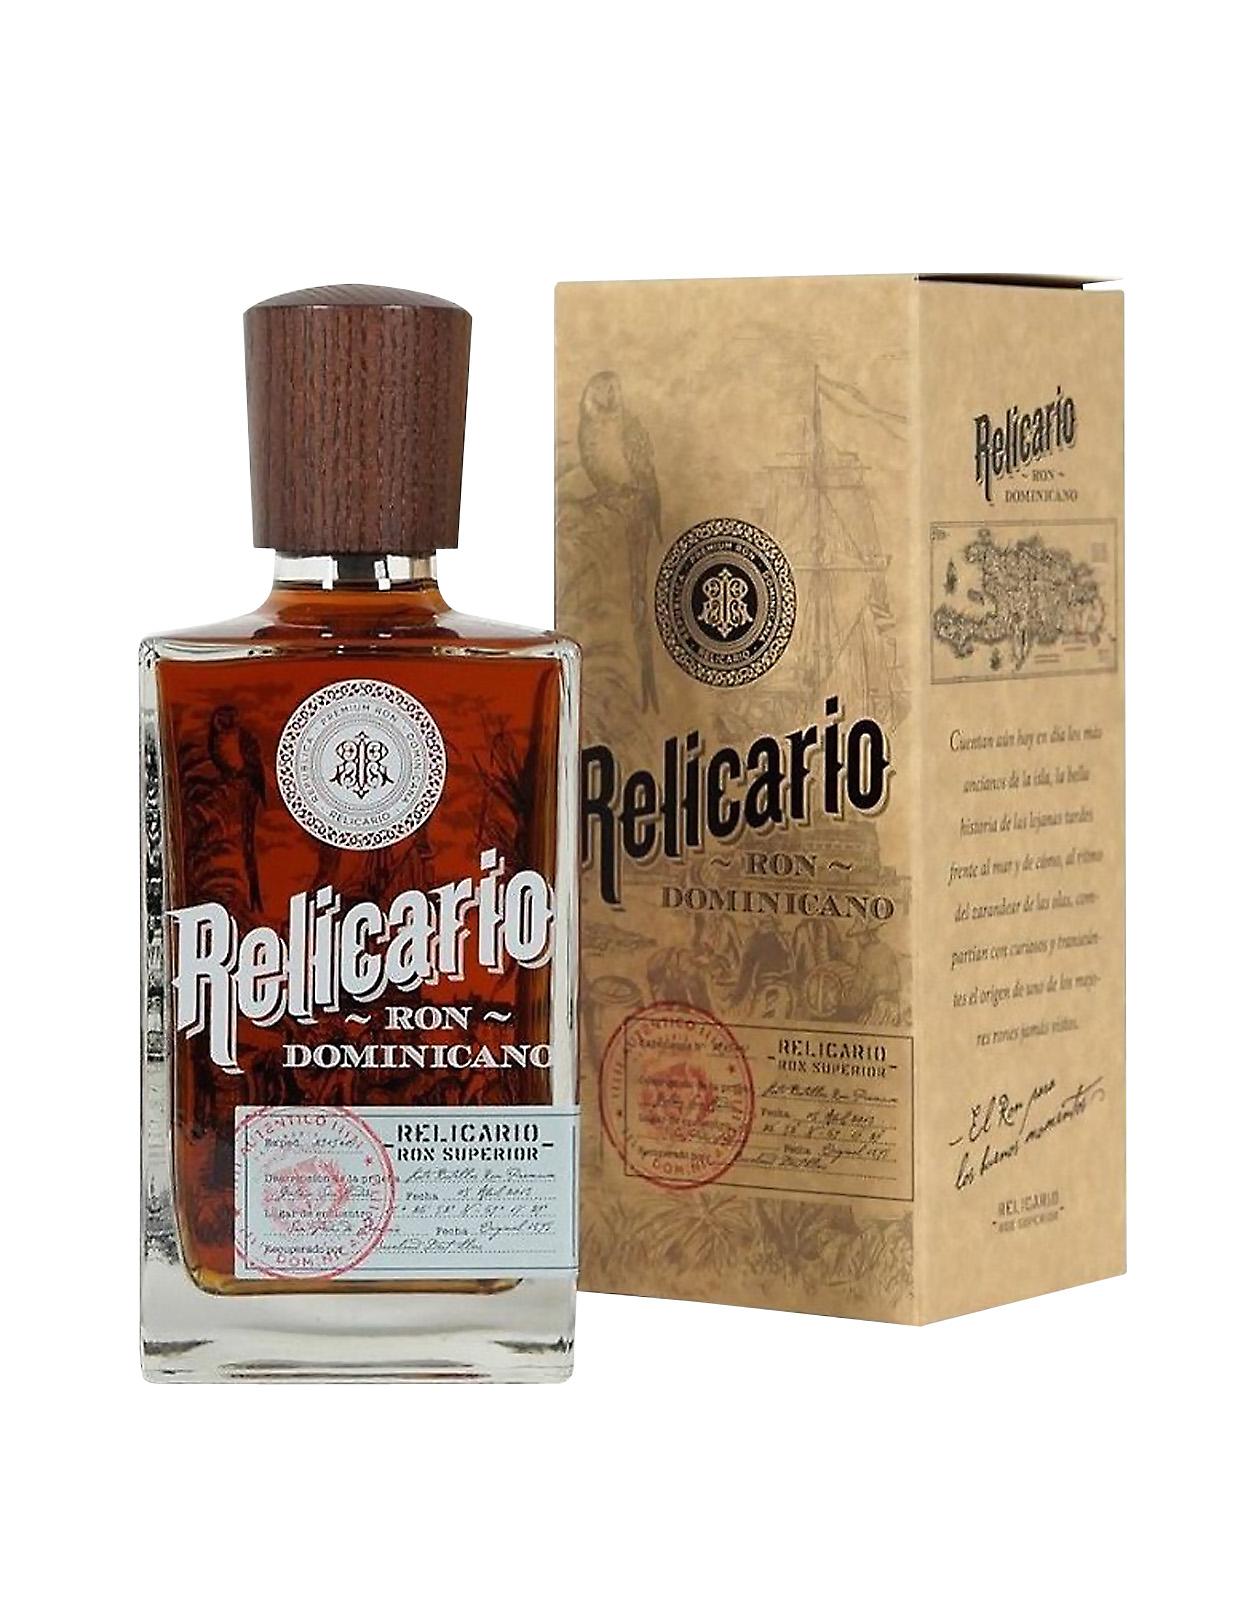 Relicario Ron Dominicano Superior 0,7 L 40% rum, Bottleshop Sunny wines slnecnice mesto, petrzalka, rum, rumy, rozvoz alkoholu, eshop